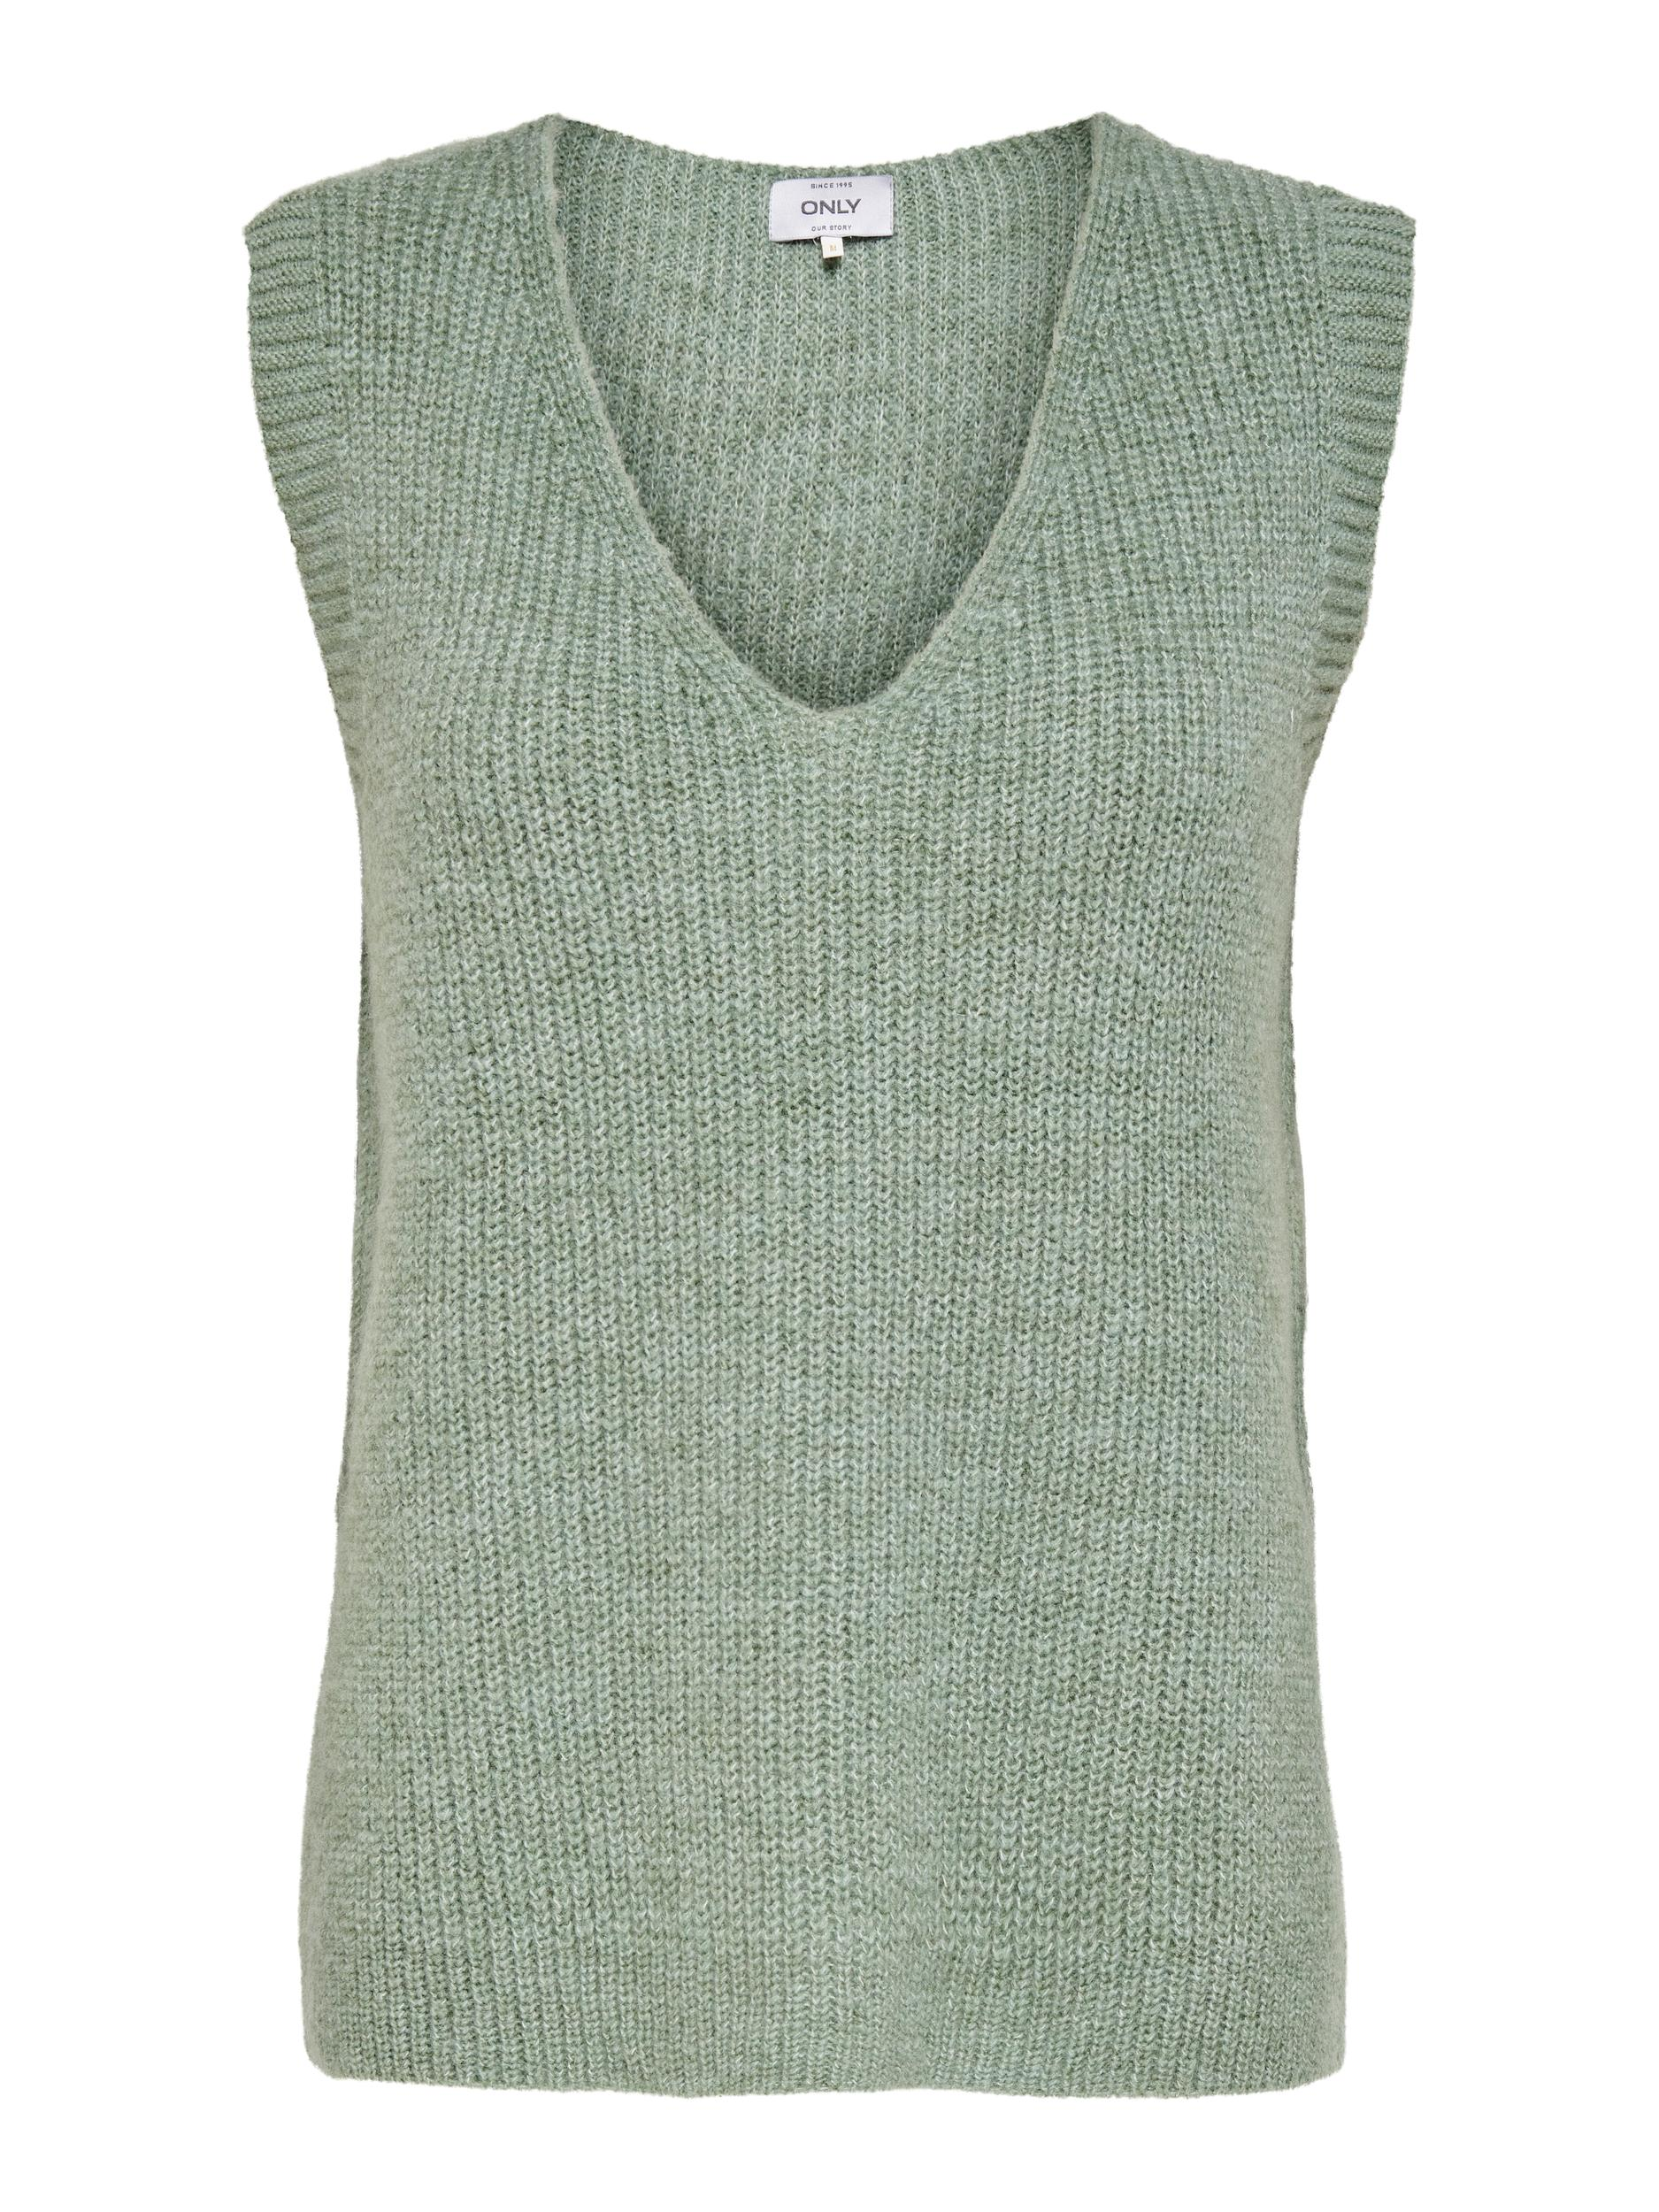 ONLY Cora vest, granite green, x-large